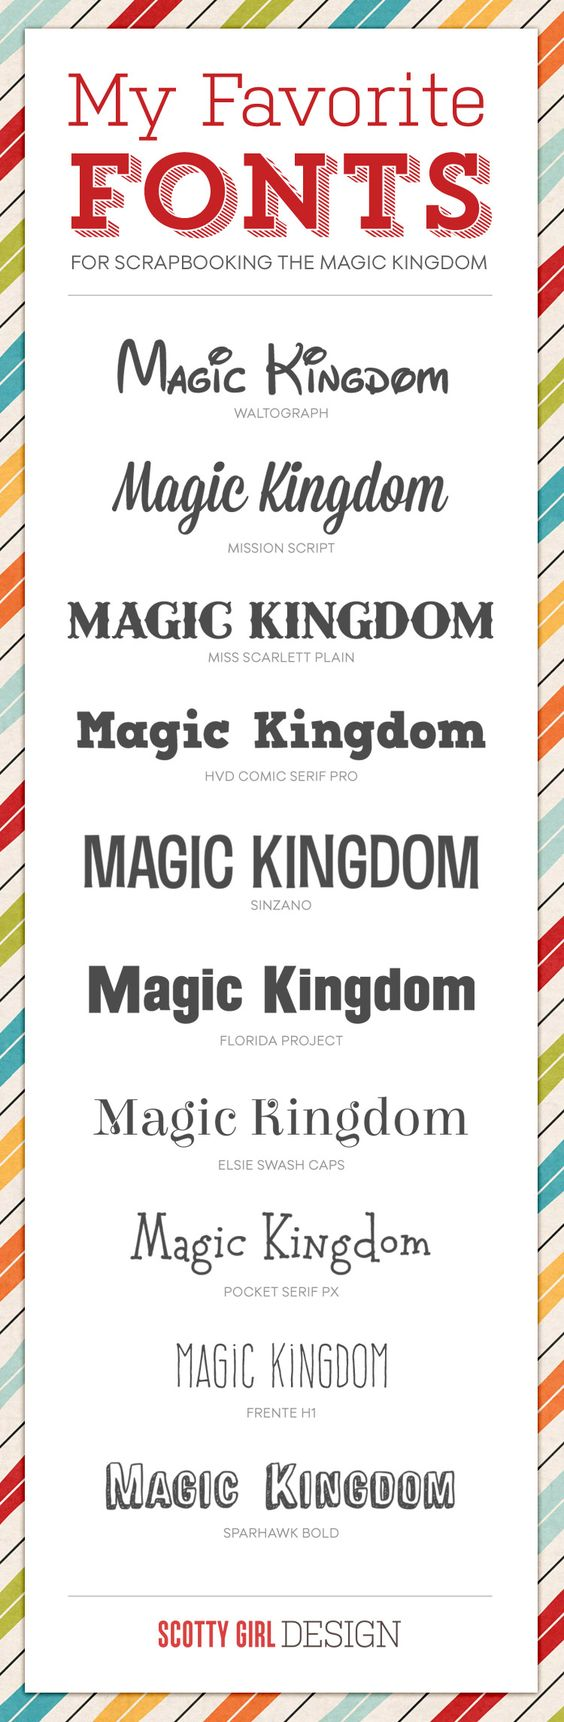 My favorite fonts for scrapbooking the Magic Kingdom at scottygirldesign.com